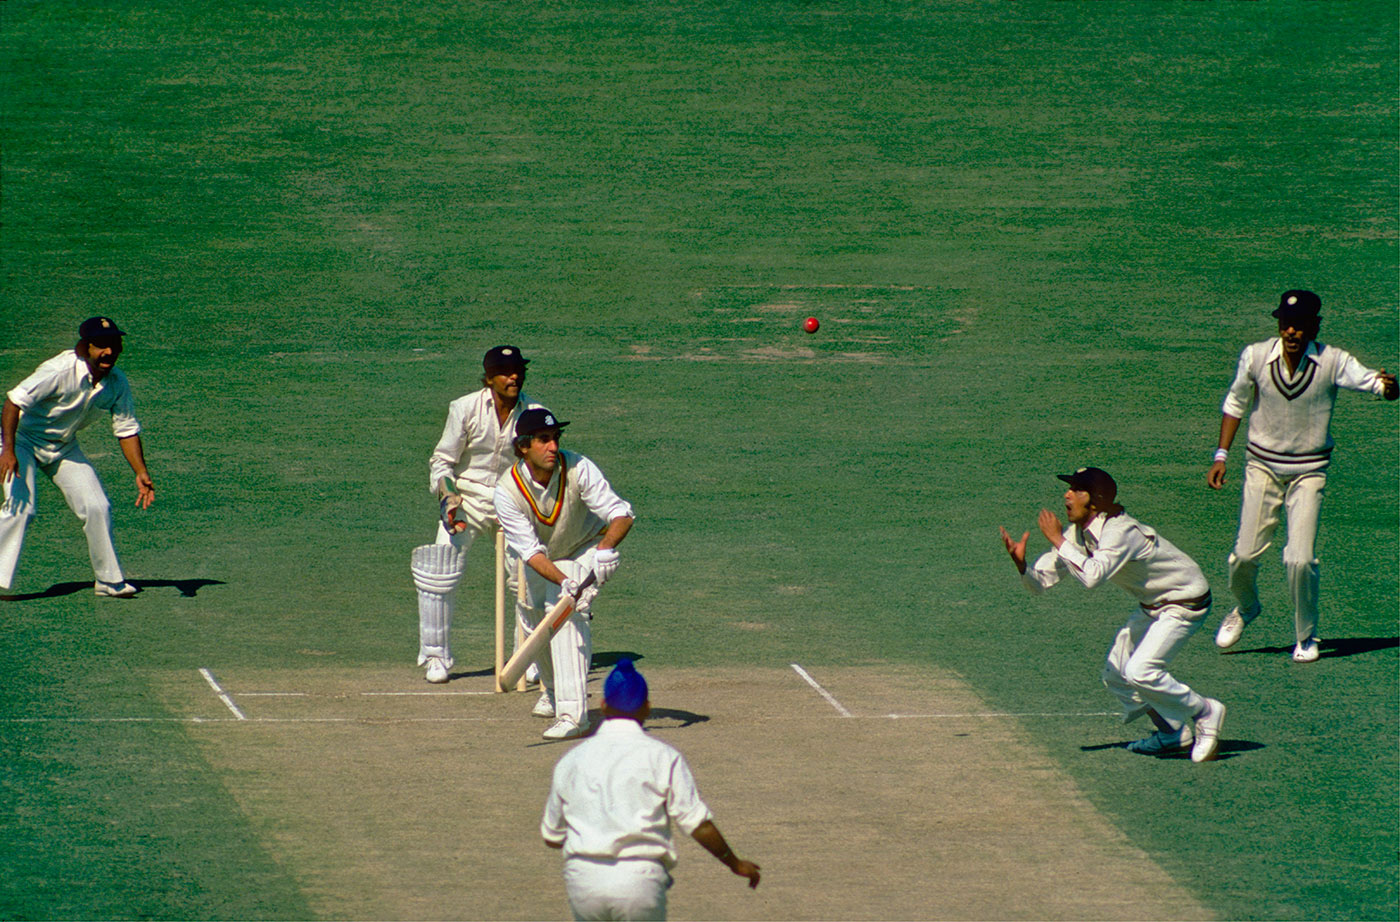 Eknath Solkar takes a yawn-inducingly easy one off Mike Brearley in the 1977 Calcutta Test